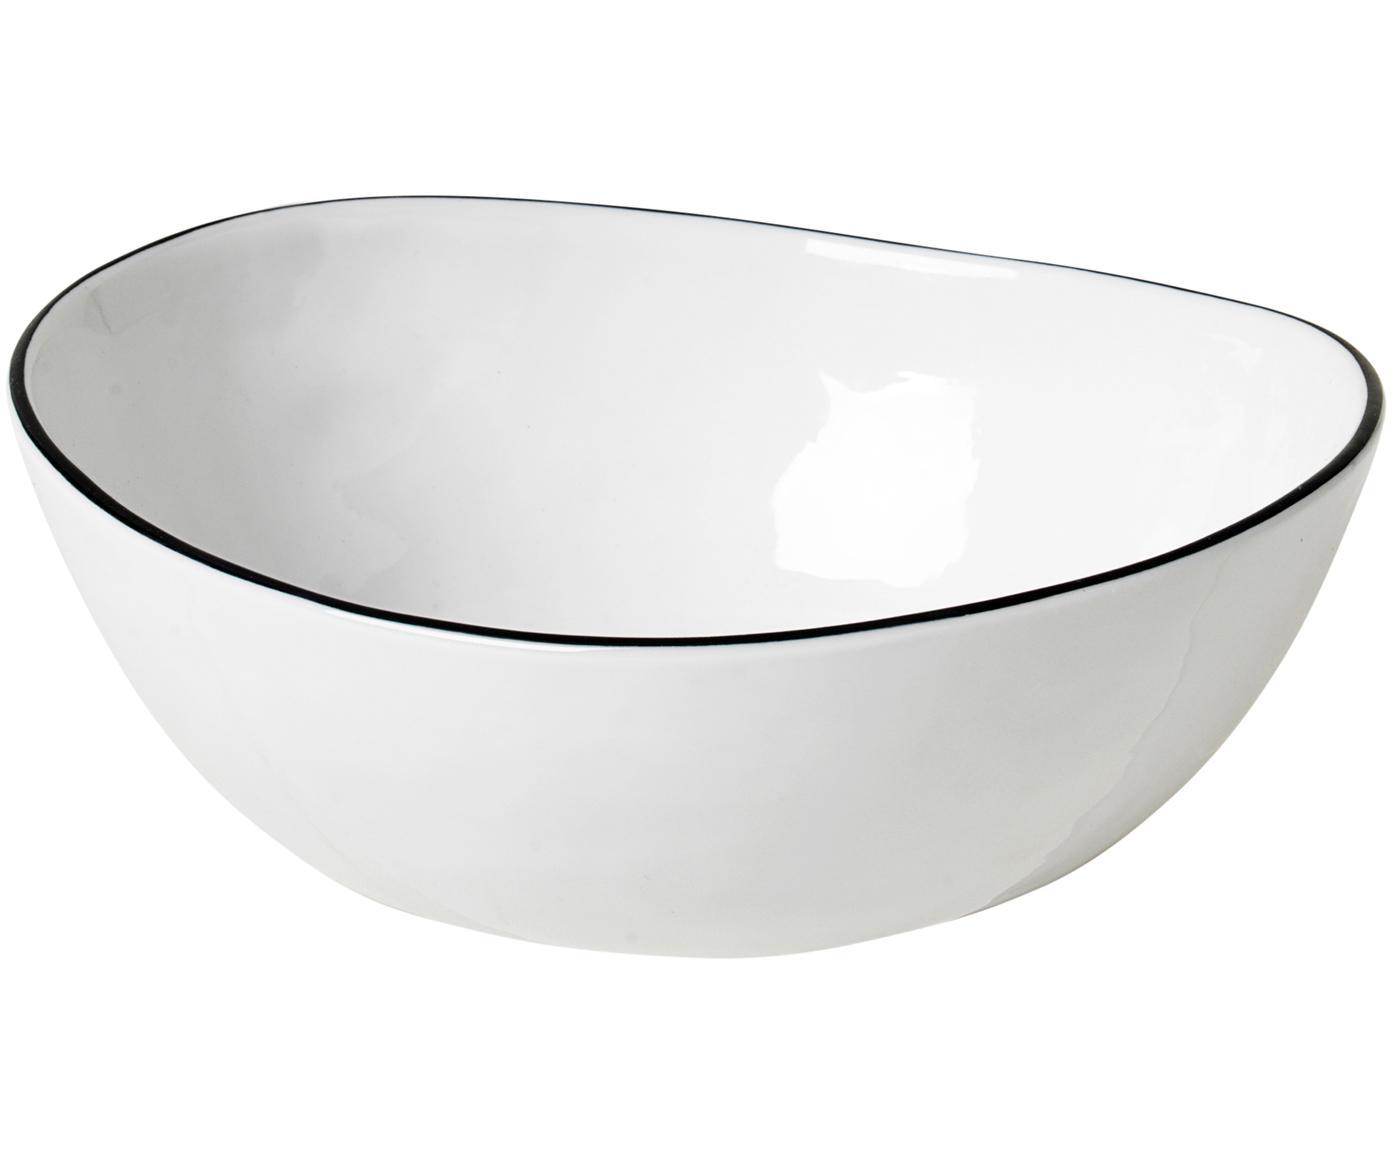 Ciotola fatta a mano Salt 4 pz, Porcellana, Bianco latteo, nero, Larg. 17 x Prof. 15 cm